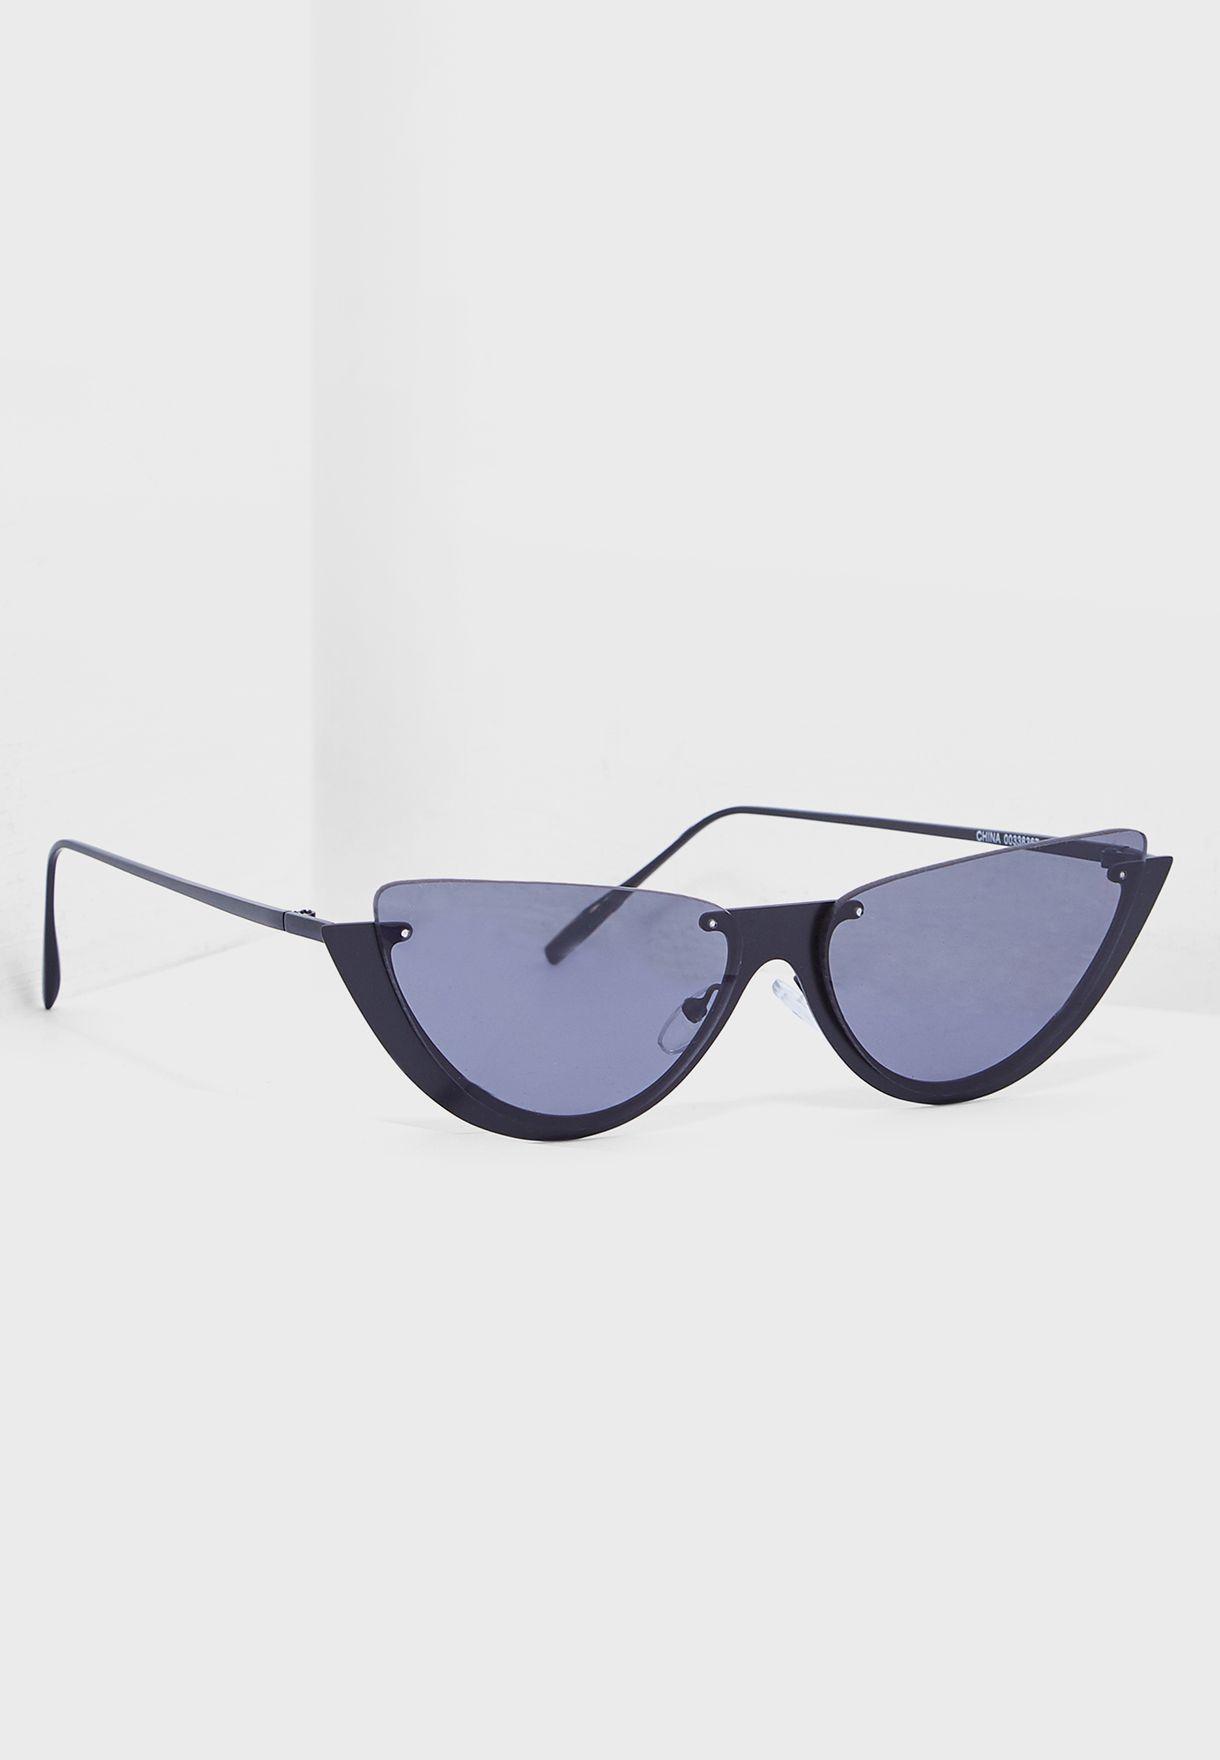 dc3098a8c Shop Forever 21 black Premium Metal Cat-Eye Sunglasses 338367 for ...